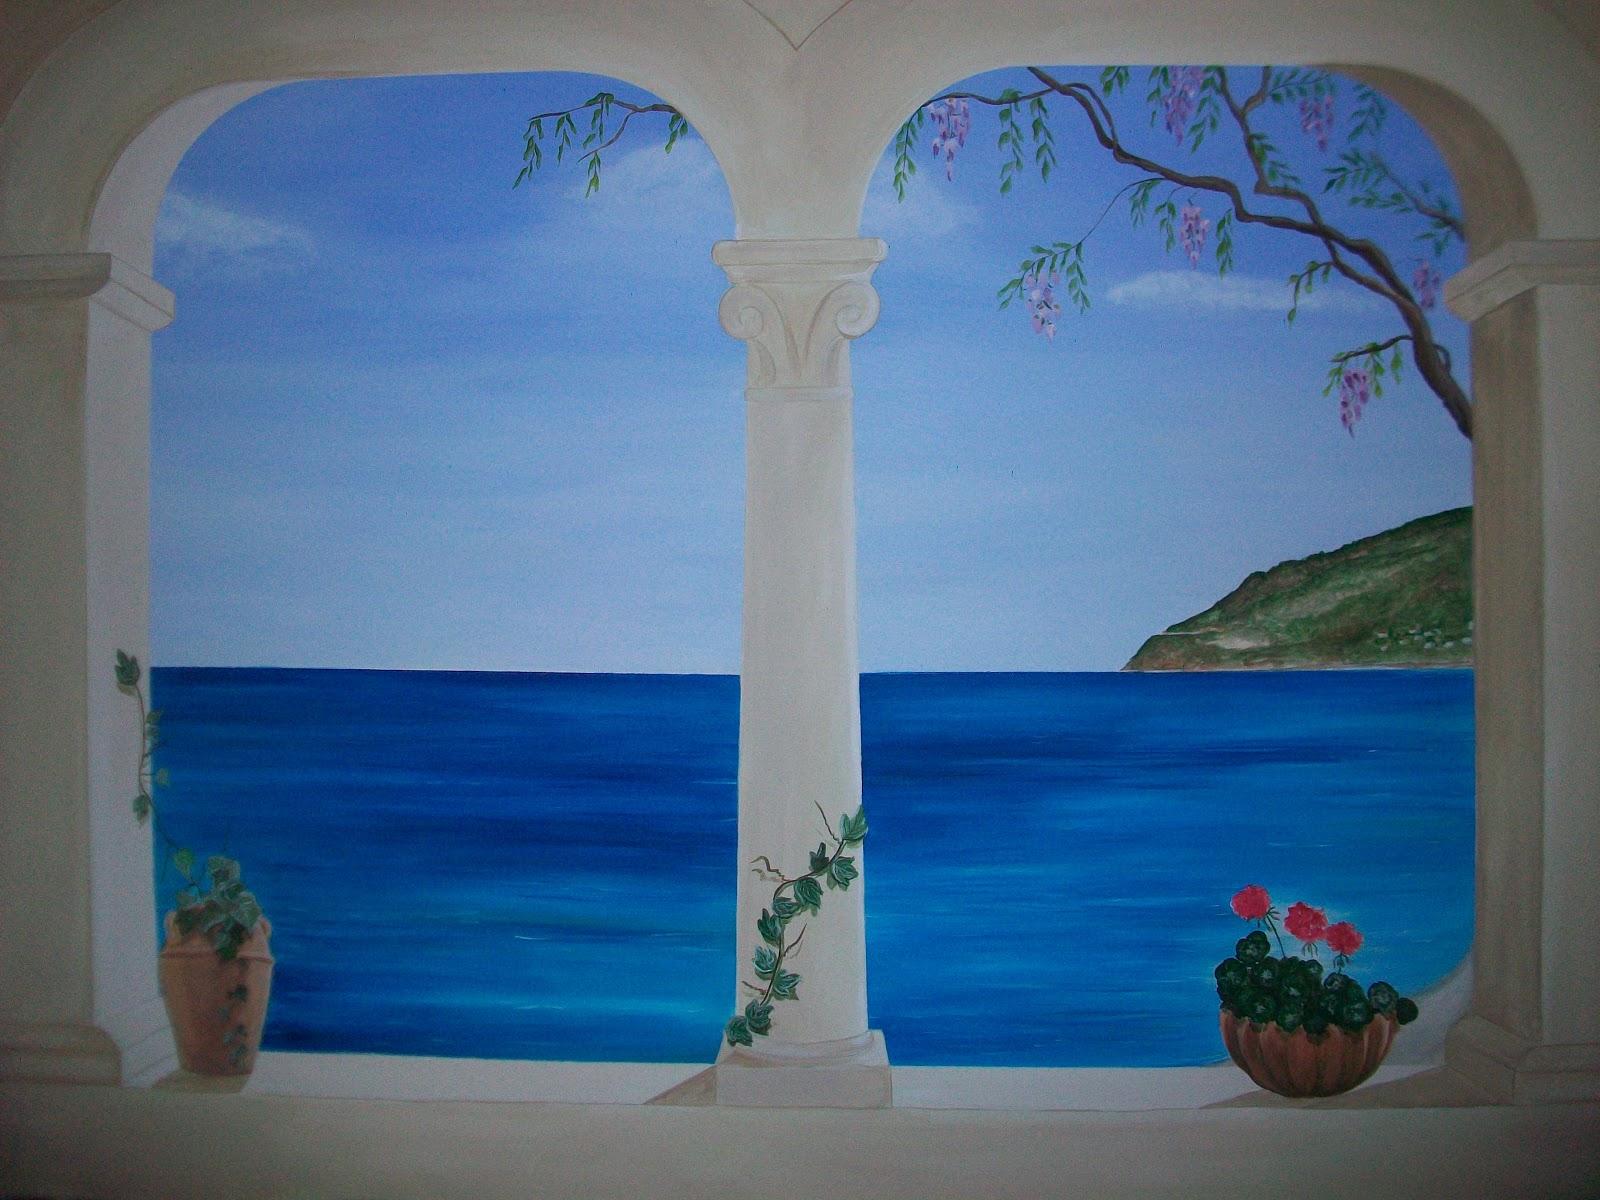 Trompe l 39 oeil murales decorazione pareti camerette - Decorazione di interni ...